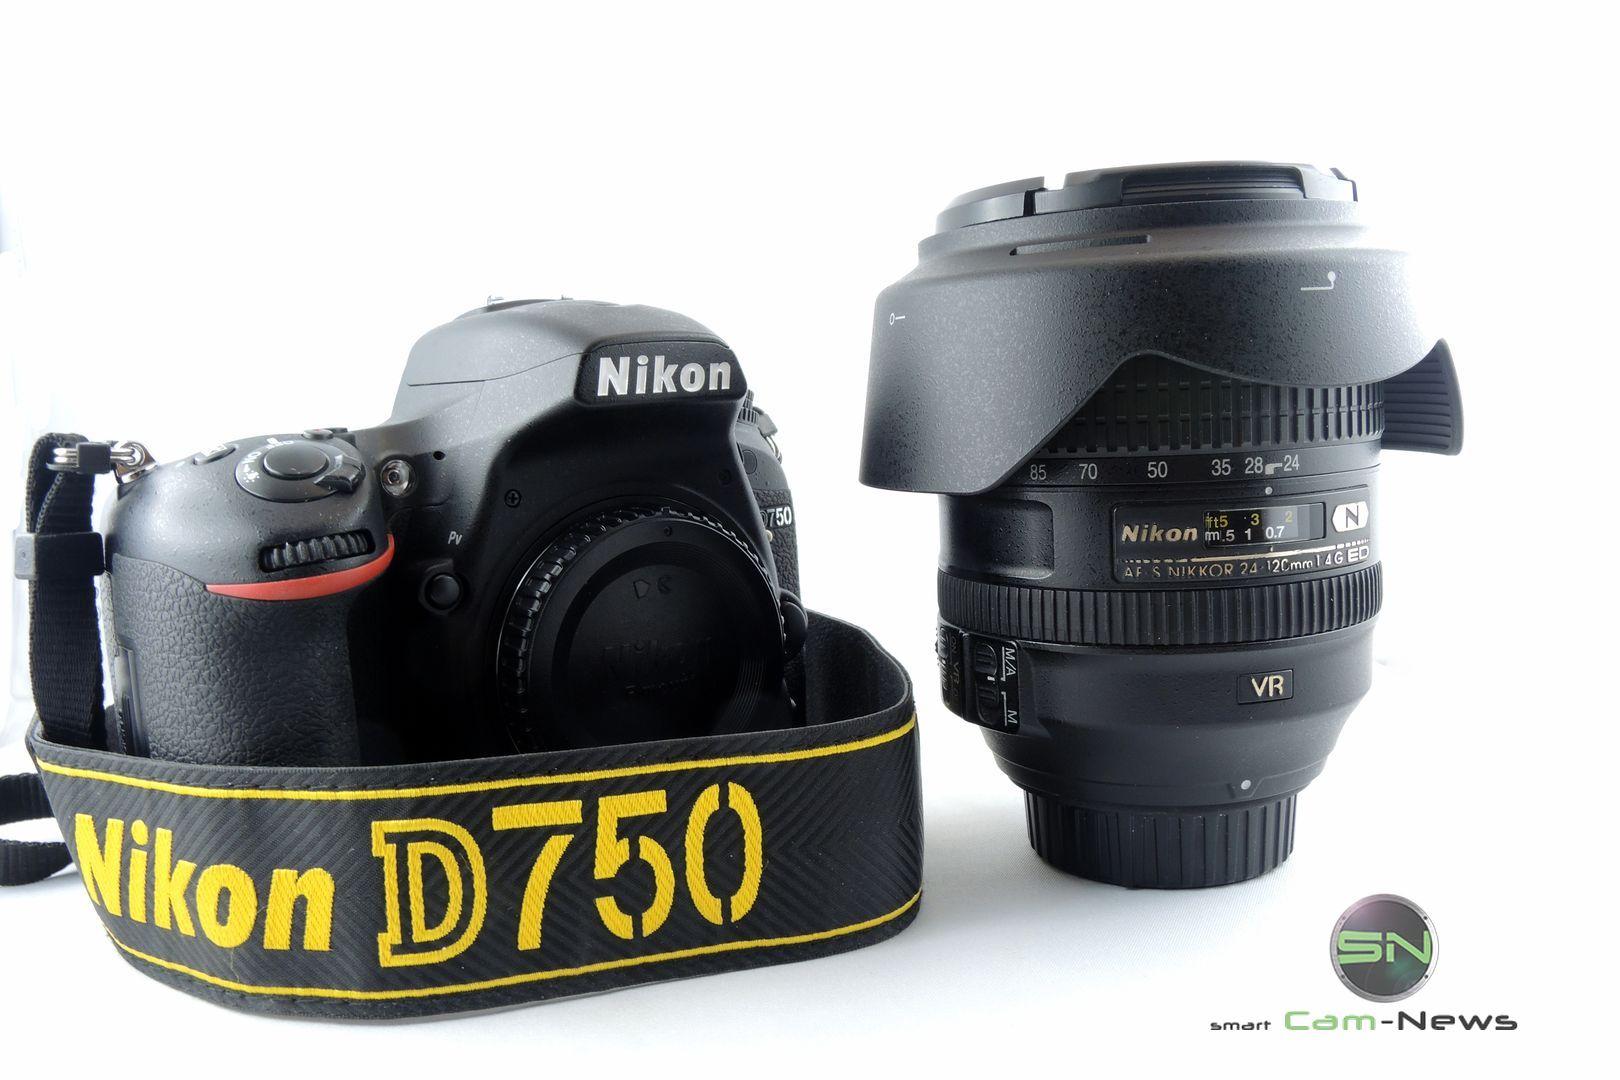 Reiseset - Nikon D750 Nikkor 24 120mm - SmartCamNews